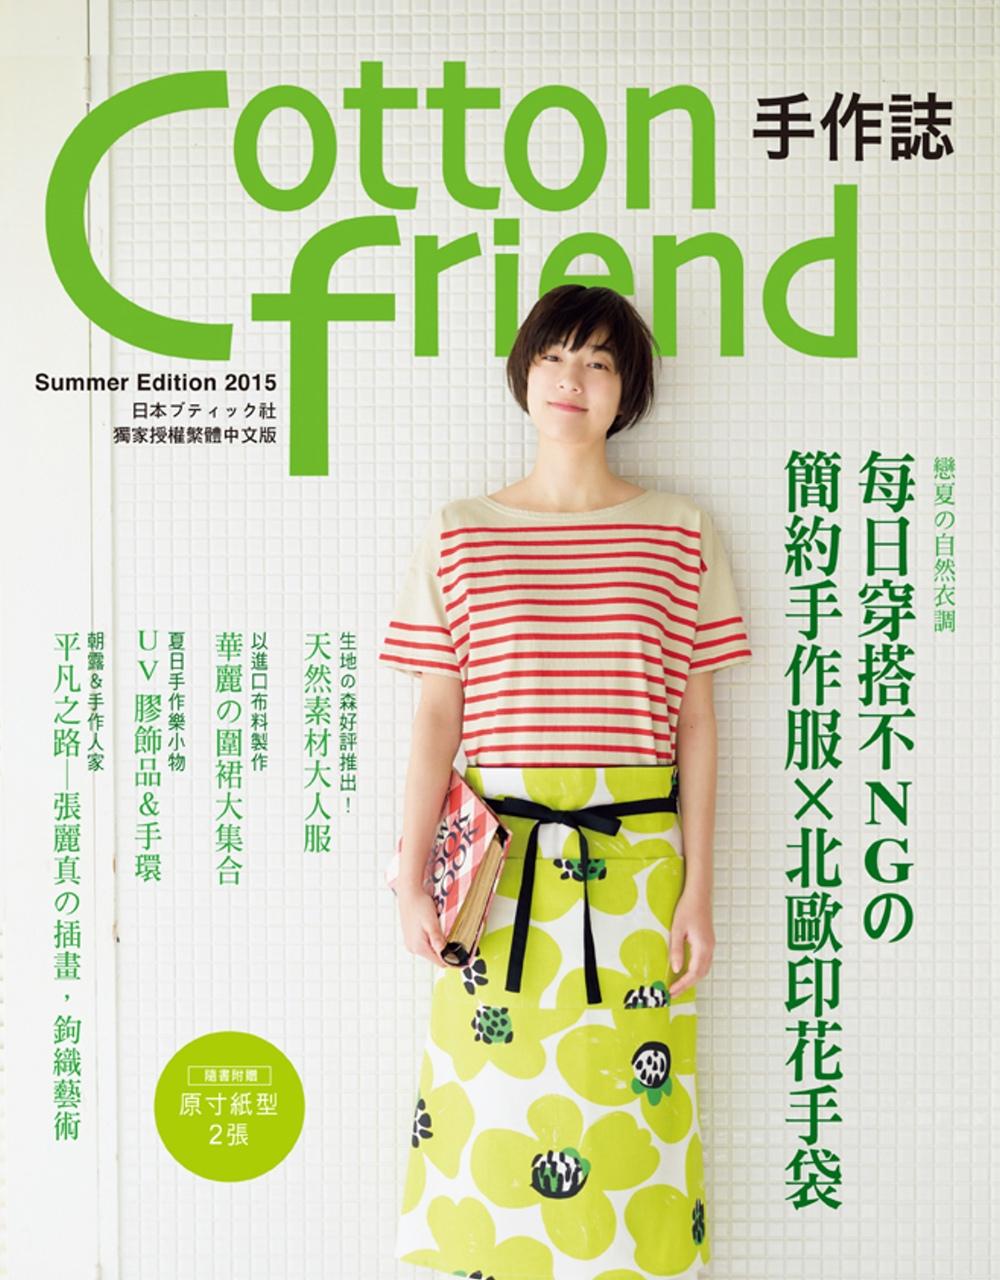 Cotton friend 手作誌29:戀夏の自然衣調 每日穿搭不NGの簡約手作服×北歐印